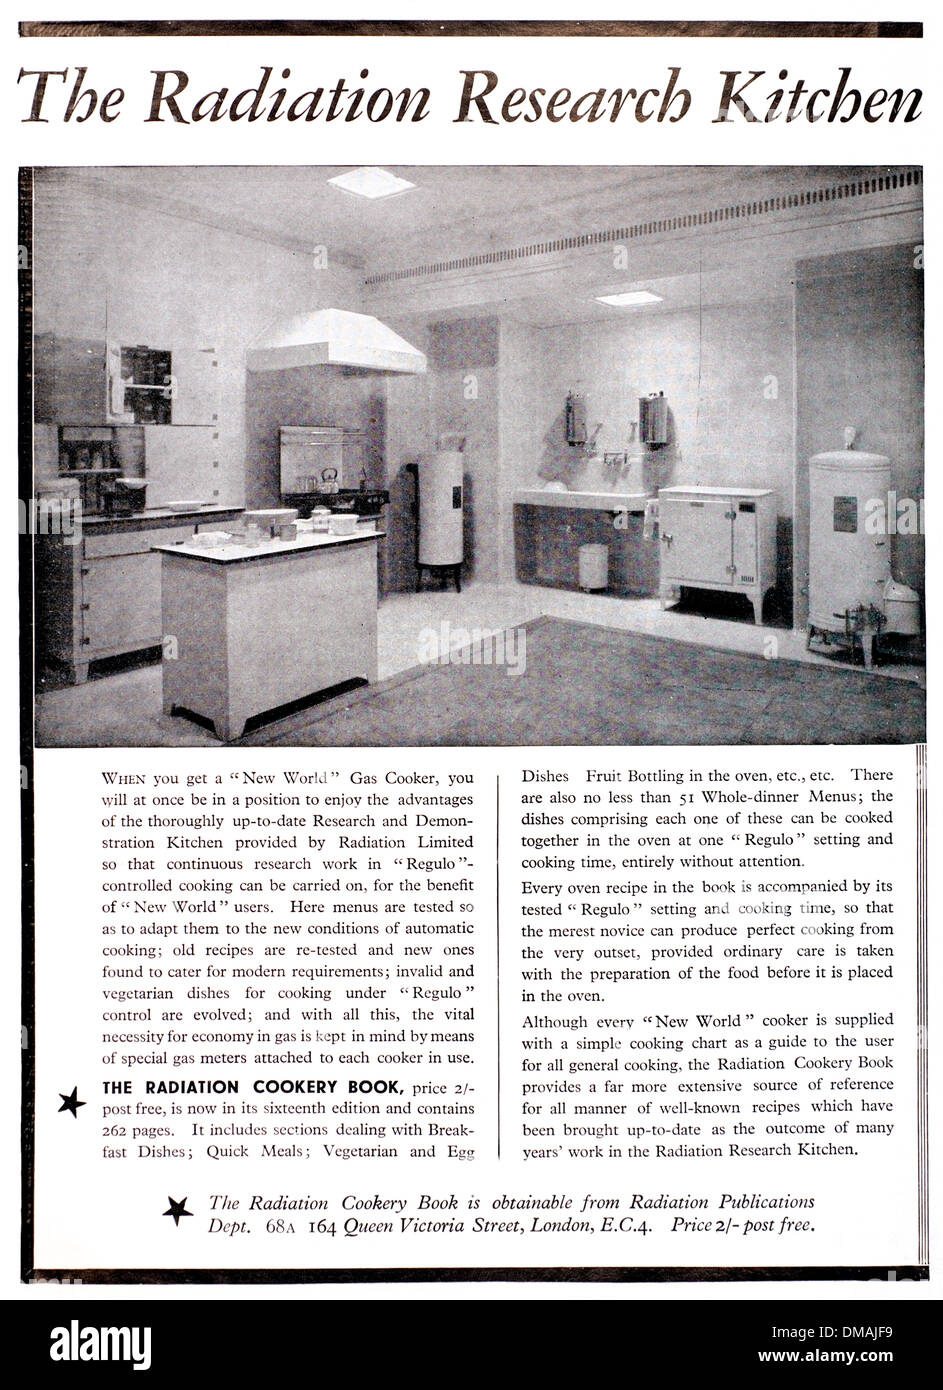 Kitchen Advert Stock Photos & Kitchen Advert Stock Images - Alamy